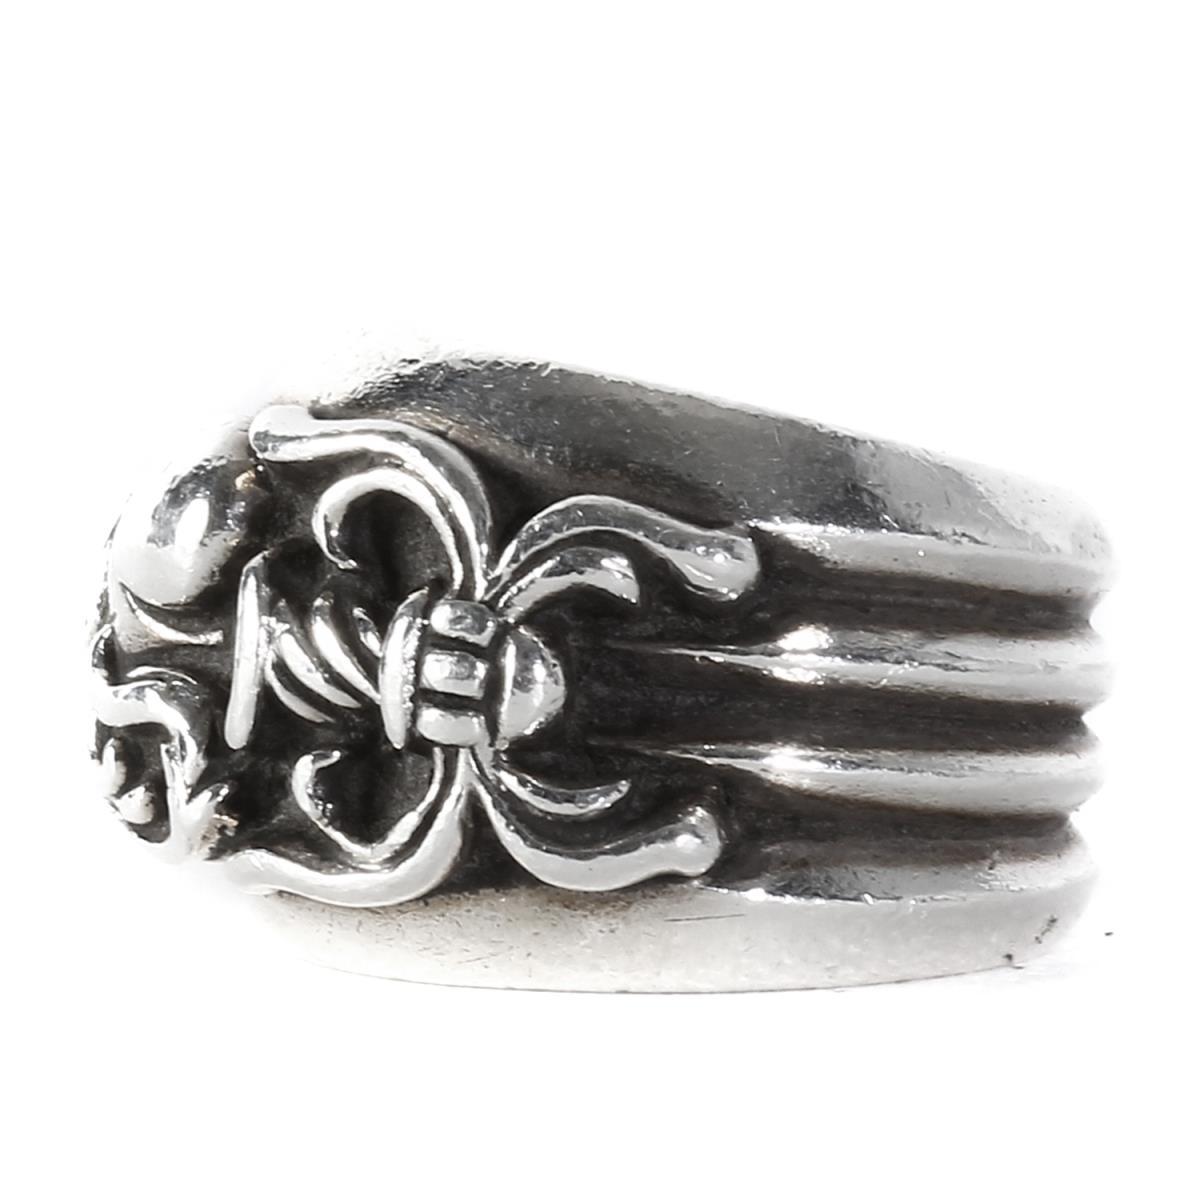 CHROME HEARTS (クロムハーツ) ダガーハートリング(Dagger Heart Ring) シルバー 15号 【メンズ】【K2347】【中古】【あす楽☆対応可】